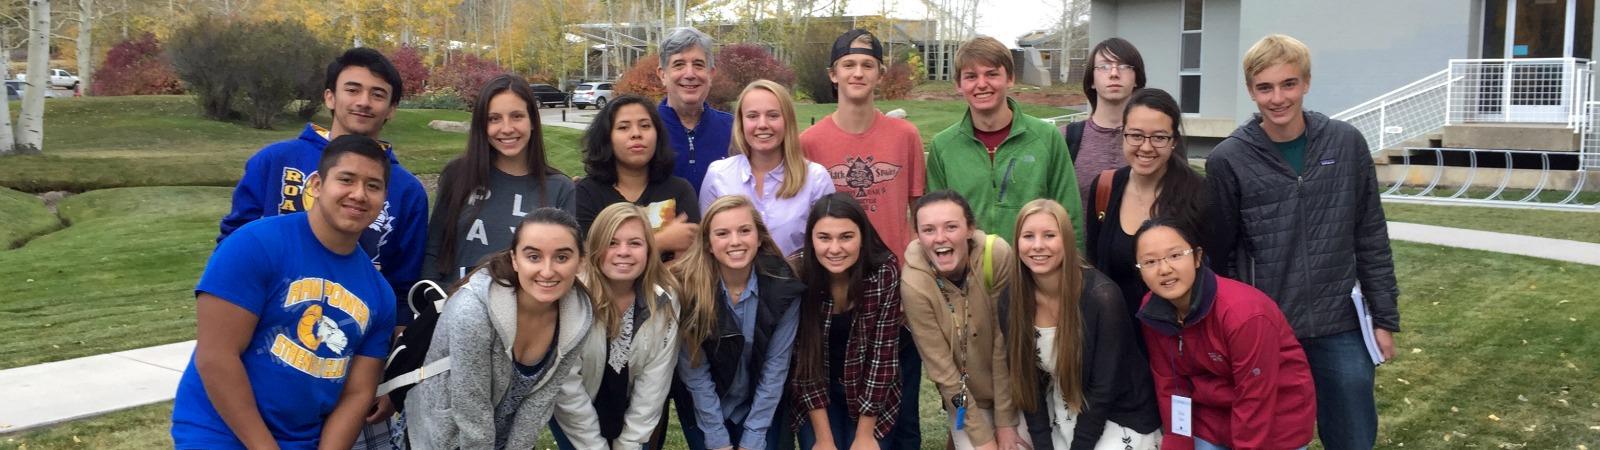 Hurst Student Seminars: Middle School Great Ideas